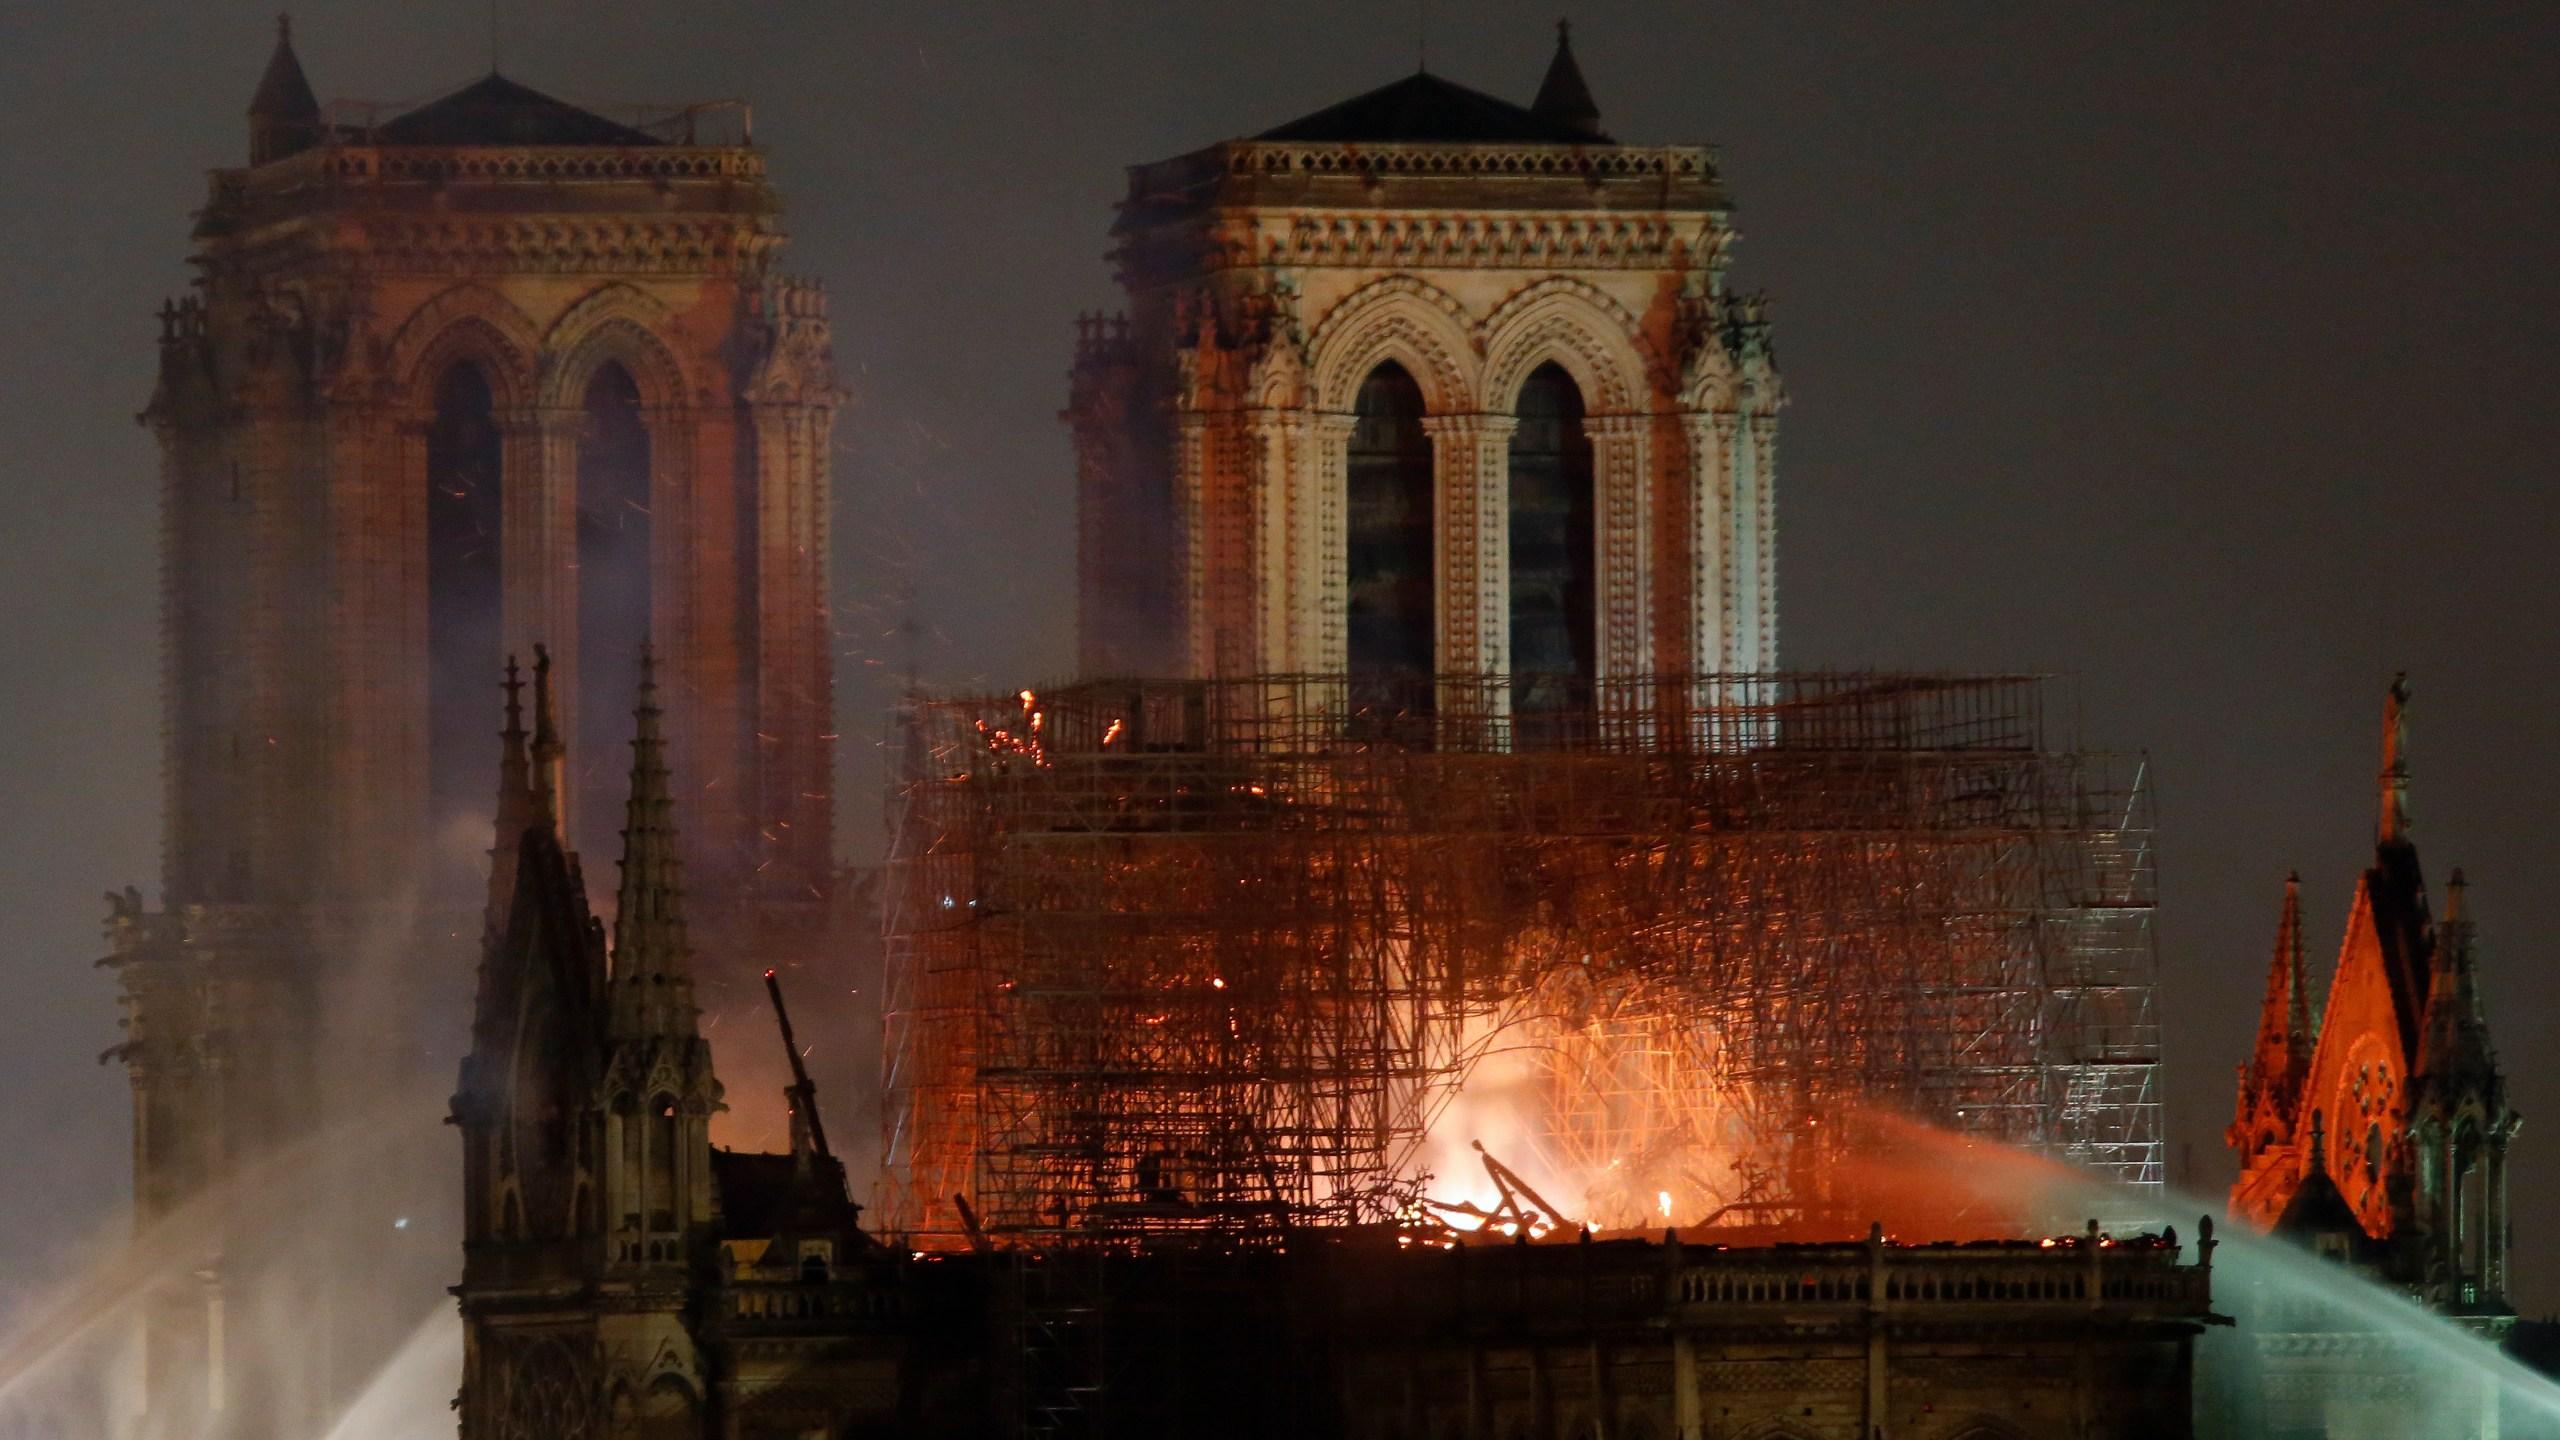 France_Notre_Dame_Fire_22829-159532.jpg93720912